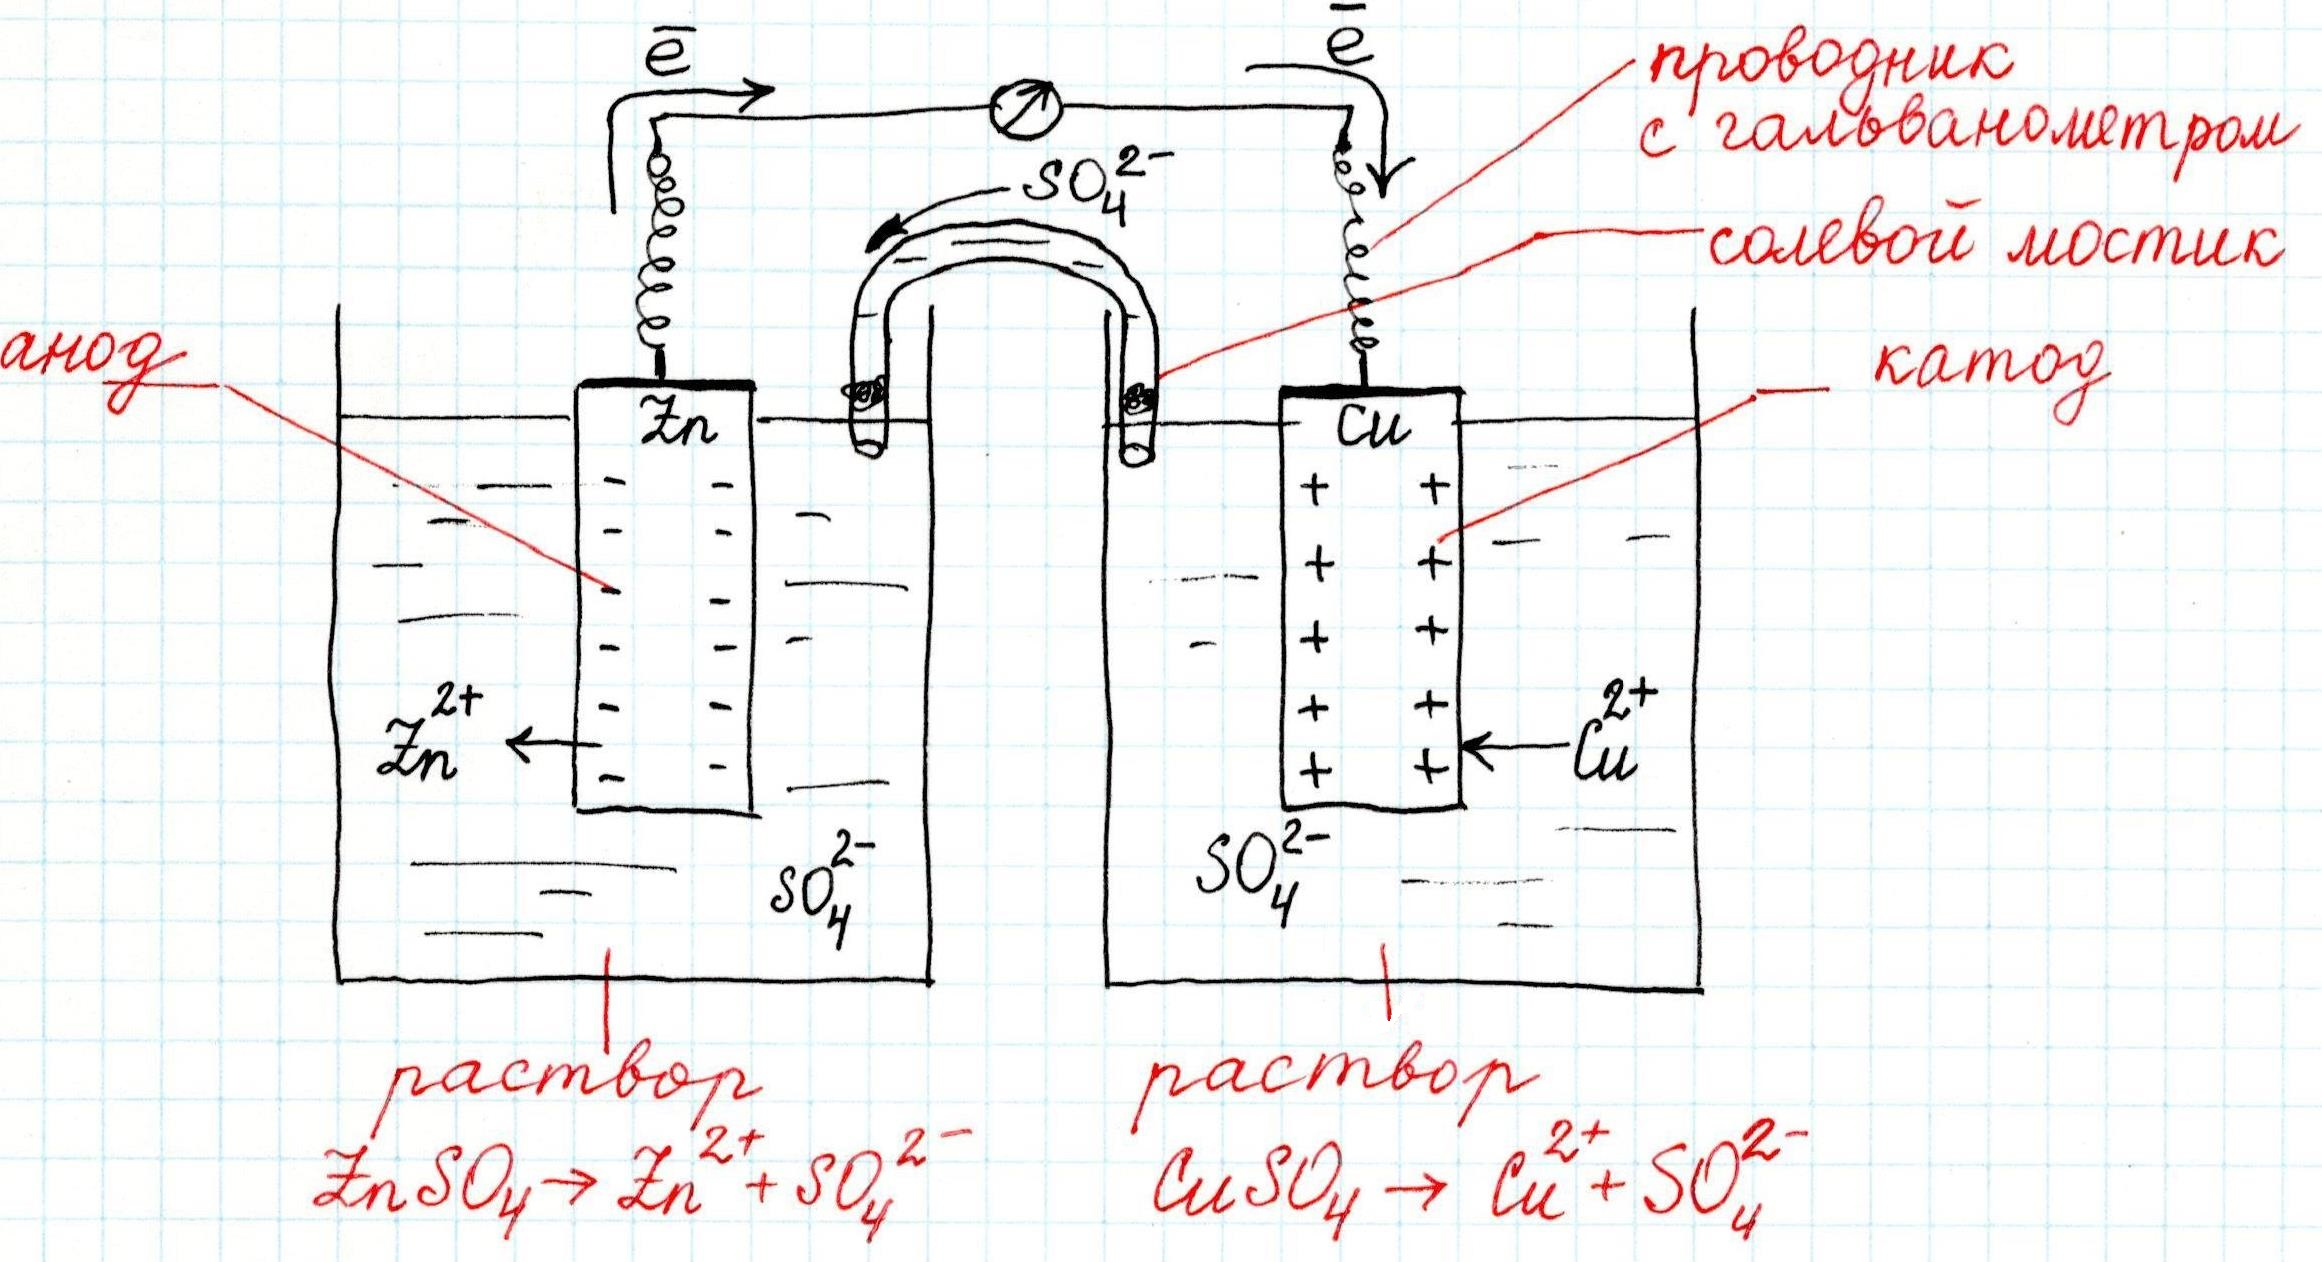 galvanicheskij-element-shema